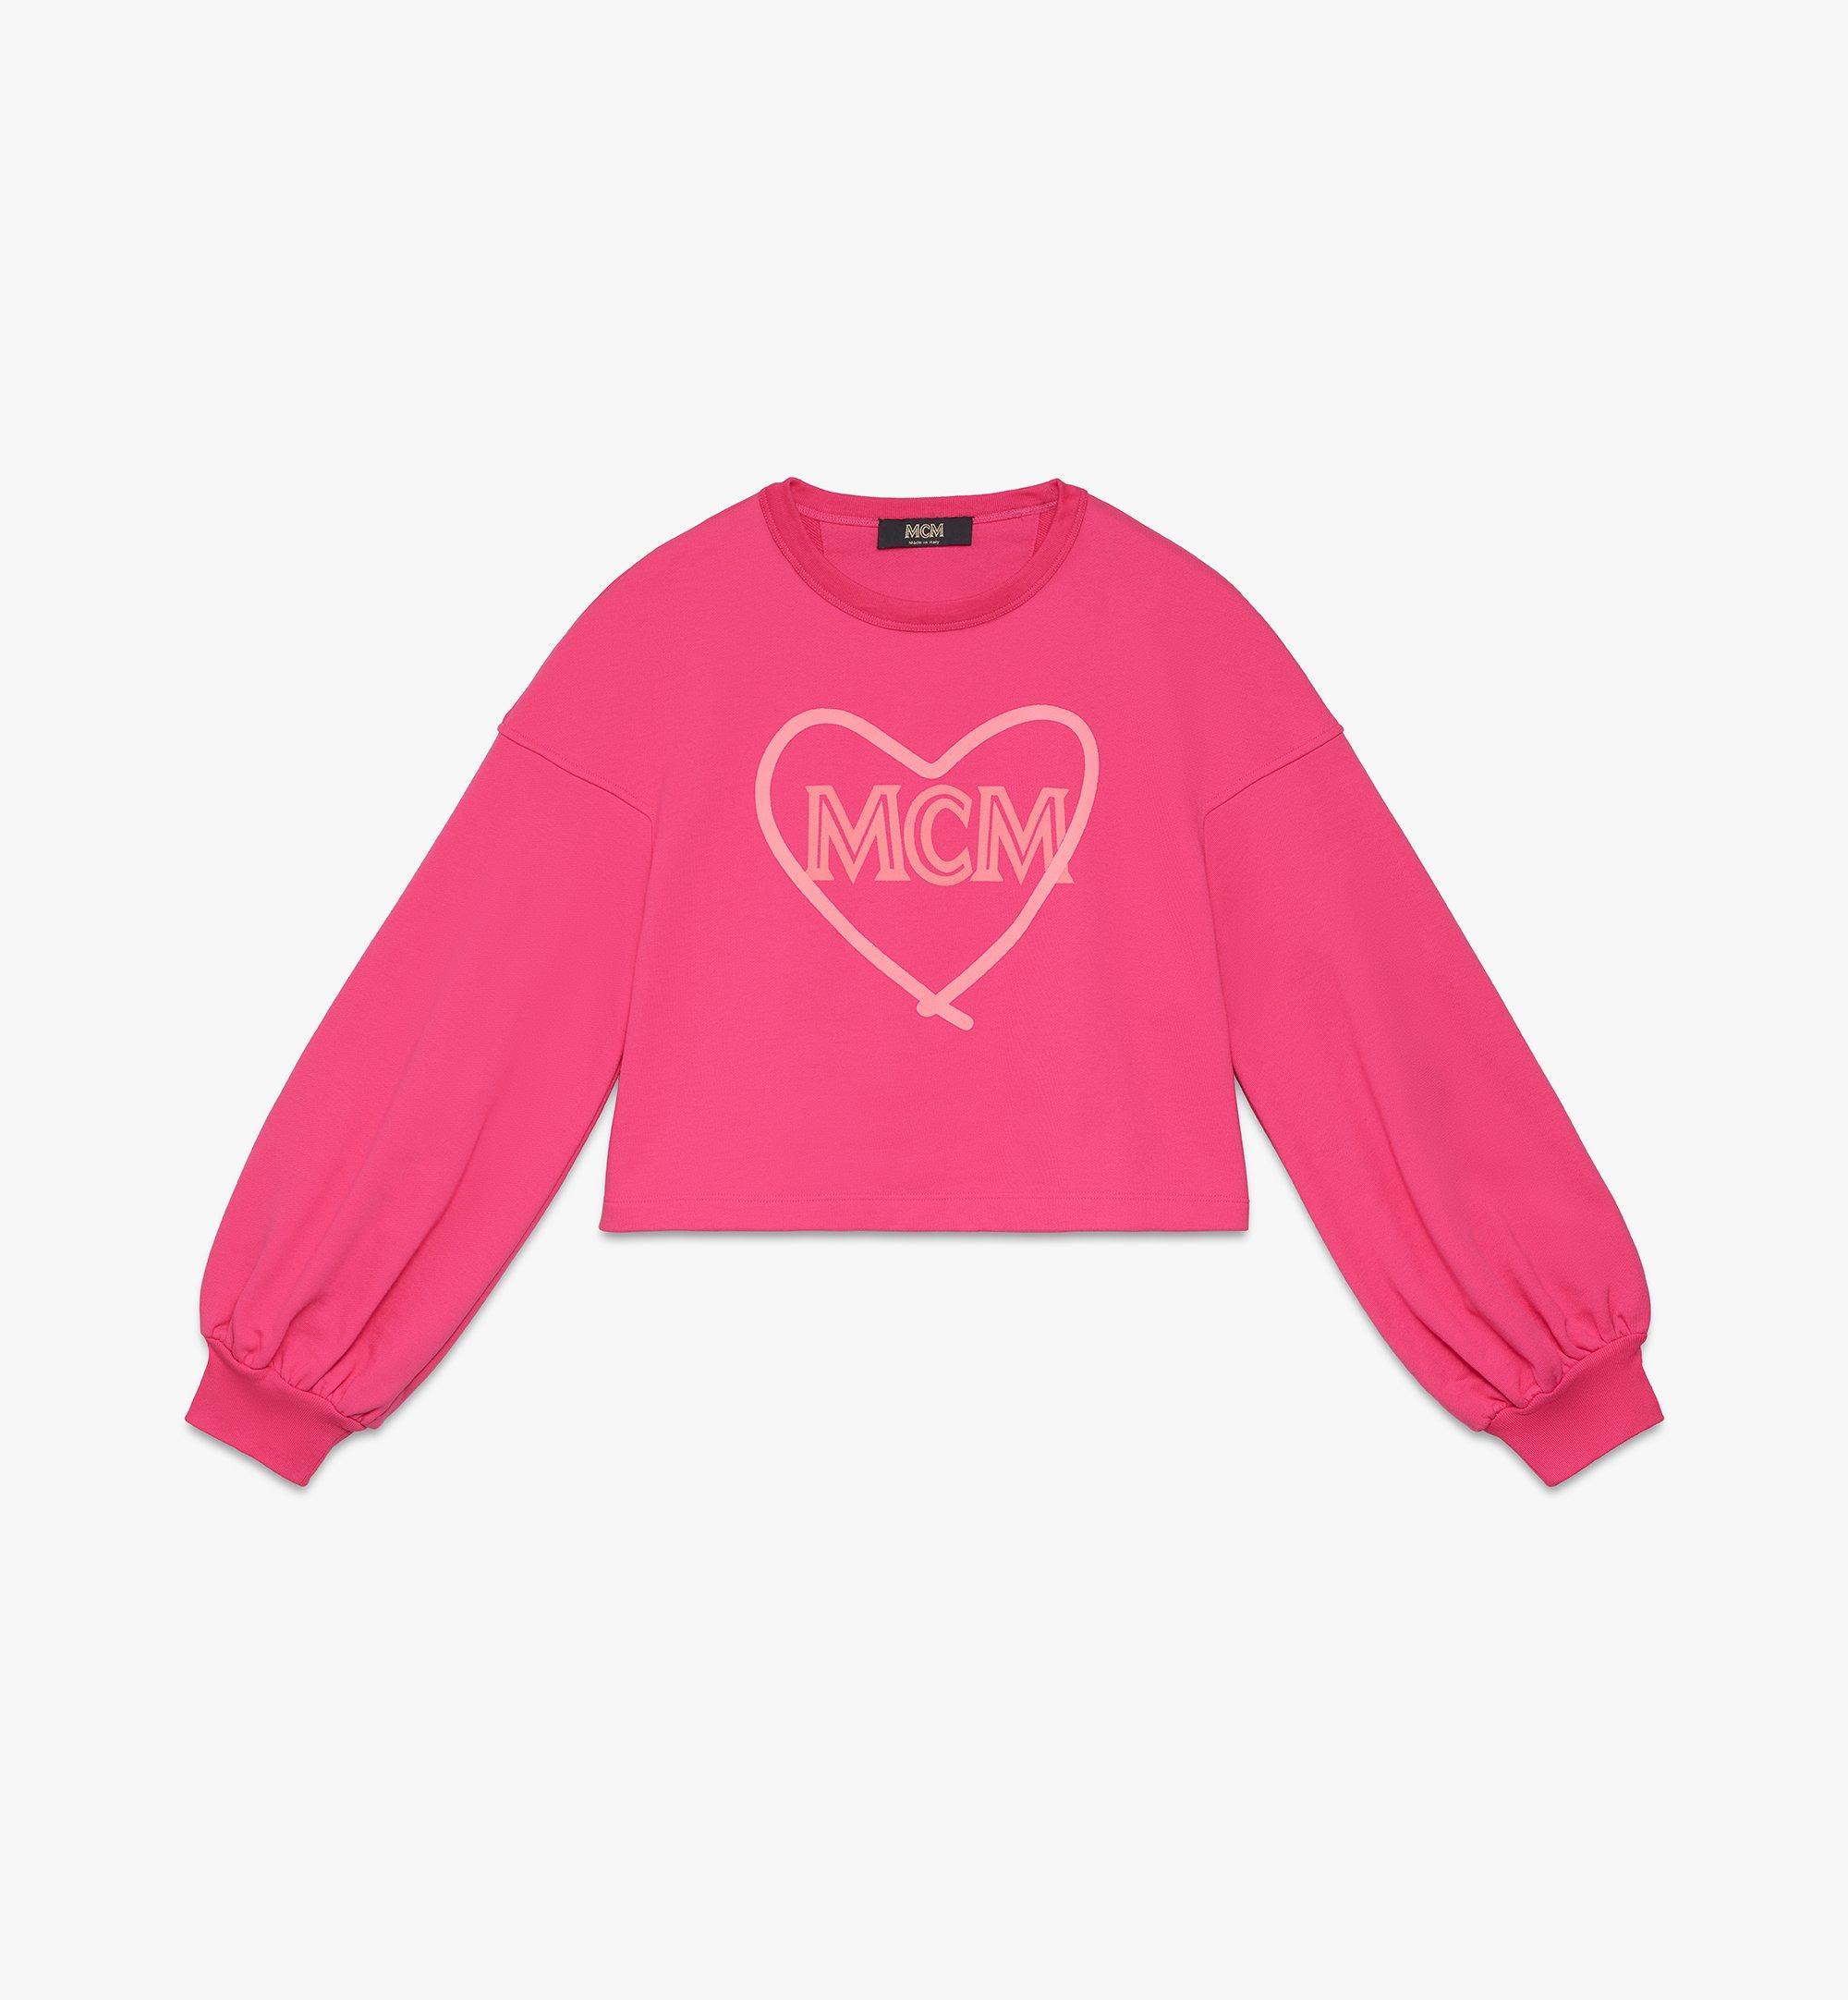 MCM Women's Valentine Balloon Sleeve Sweater Pink MFAASXN01QE0XS Alternate View 1